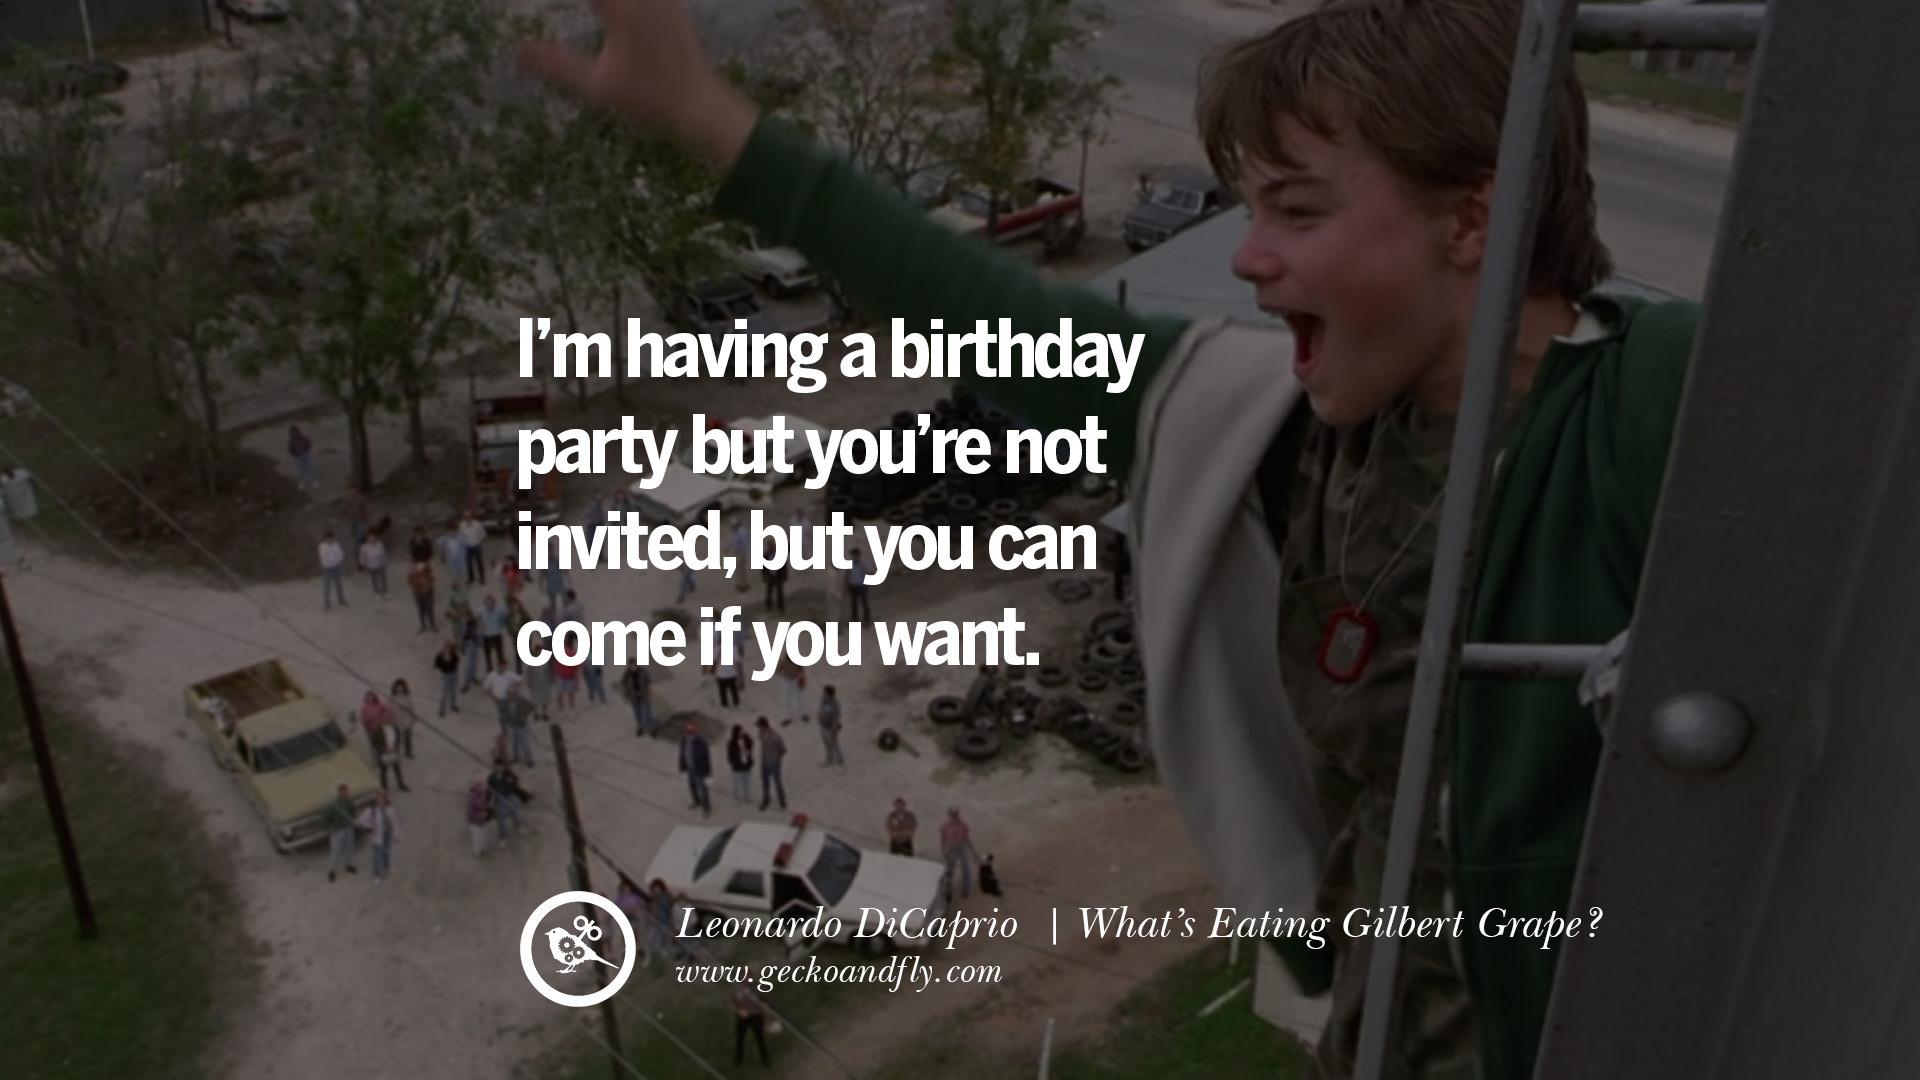 Leonardo Dicaprio Movie Quotes I'm Having A Birthday Party